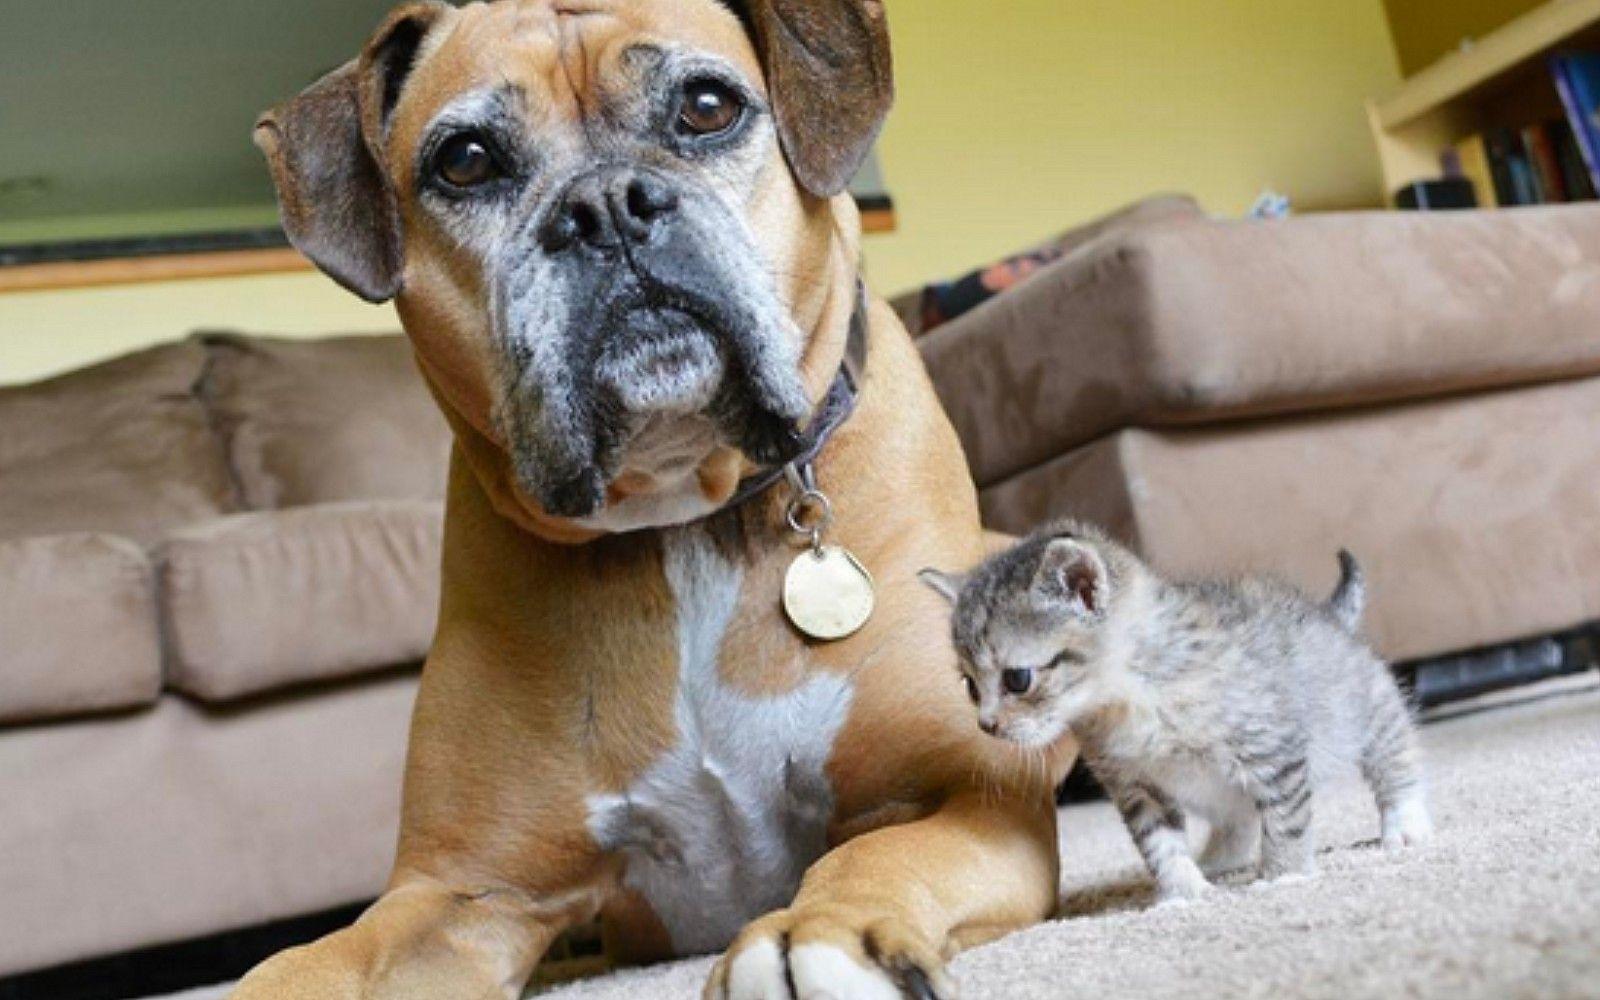 Meet Tina Merlot The World S Most Adorable Foster Kitten Who Has Her Own Guard Dog Photos Foster Kittens Guard Dogs Kitten